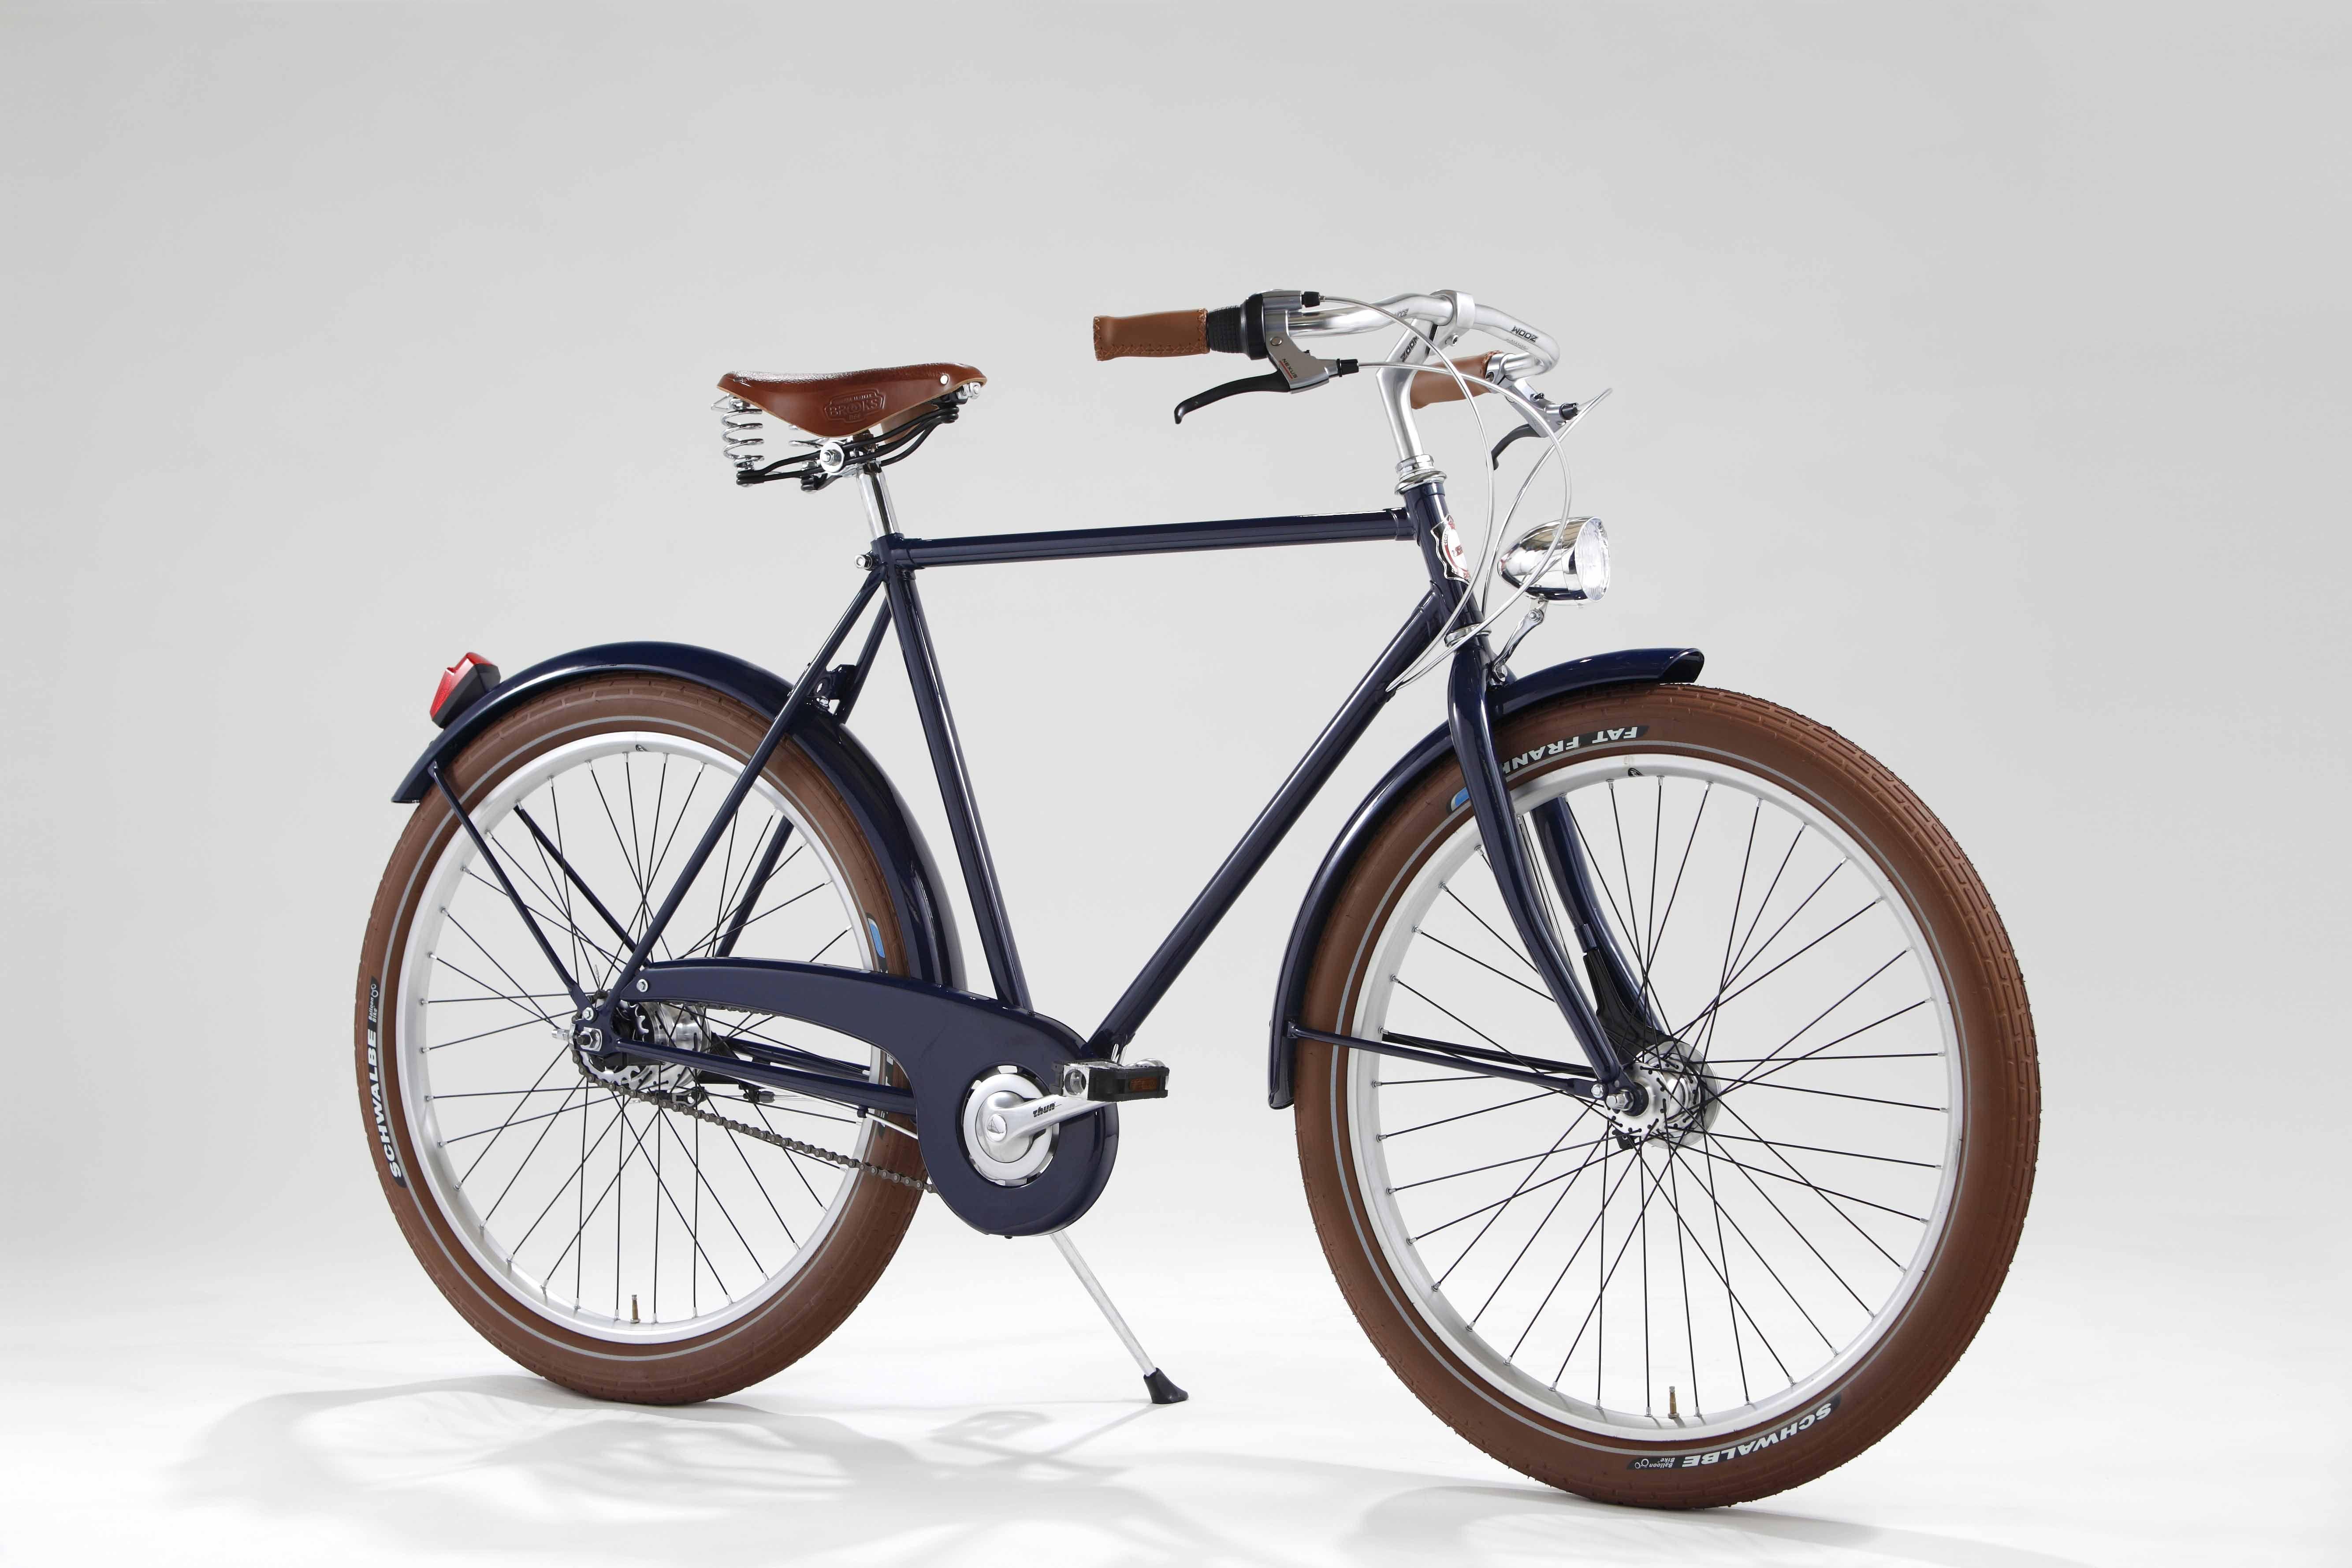 Country Uomo 7rr Bassa Definizione Vintage Bicycle Biciclette